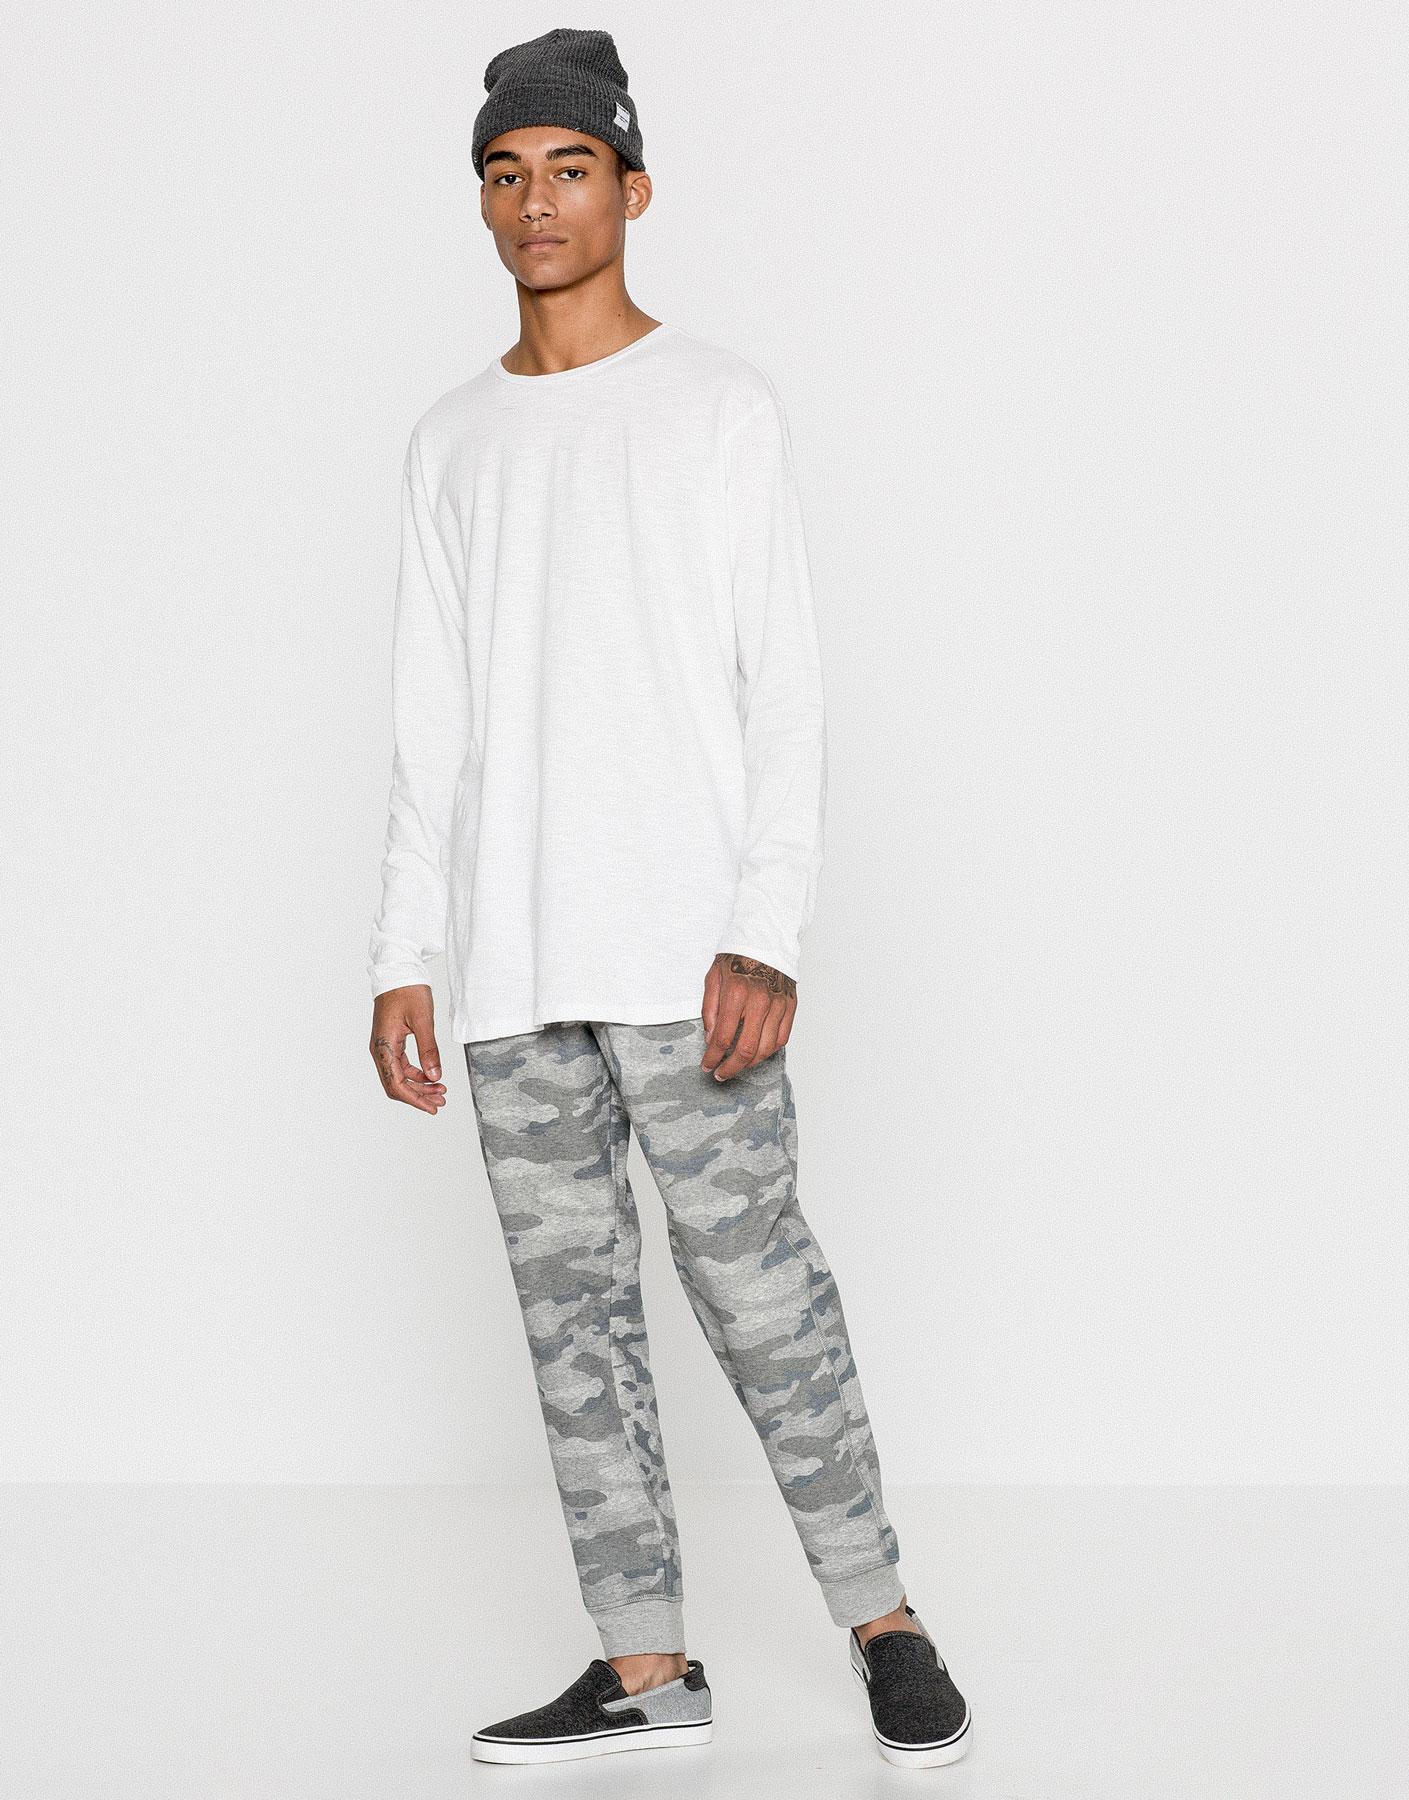 Pantalons jòguing camuflatge